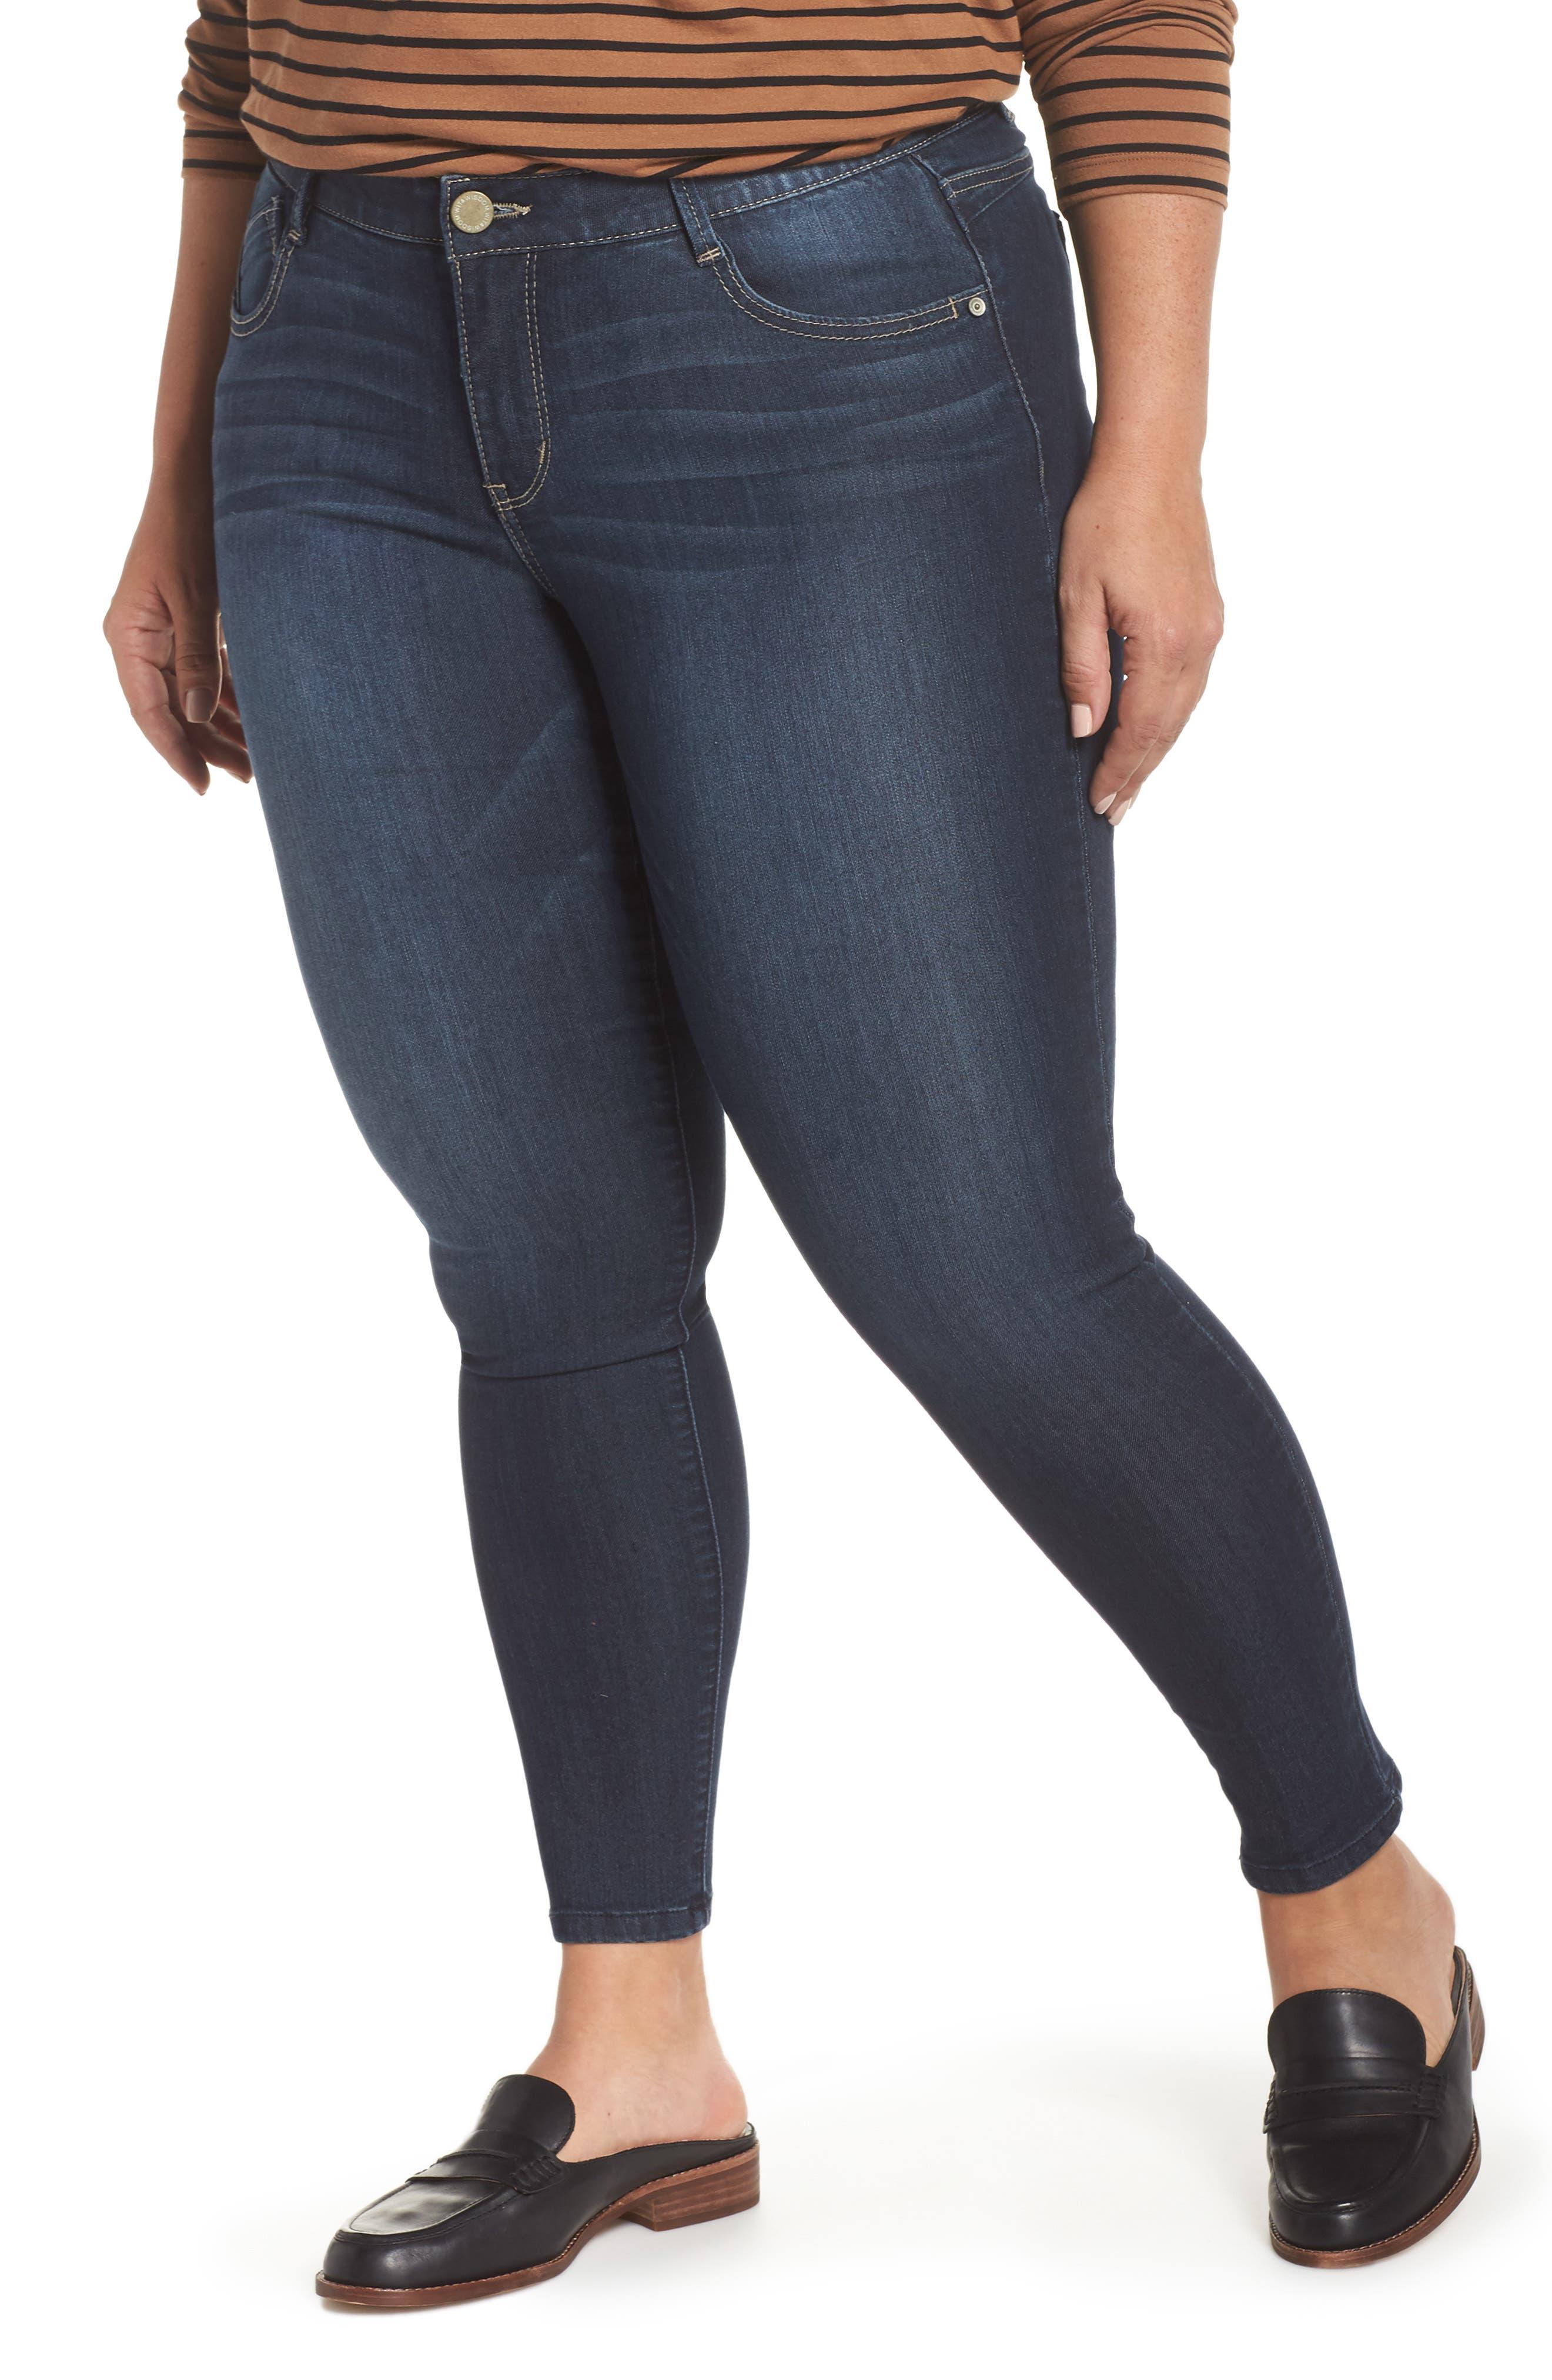 WIT & WISDOM, Ab-solution Stretch Skinny Jeans, Main thumbnail 1, color, INDIGO